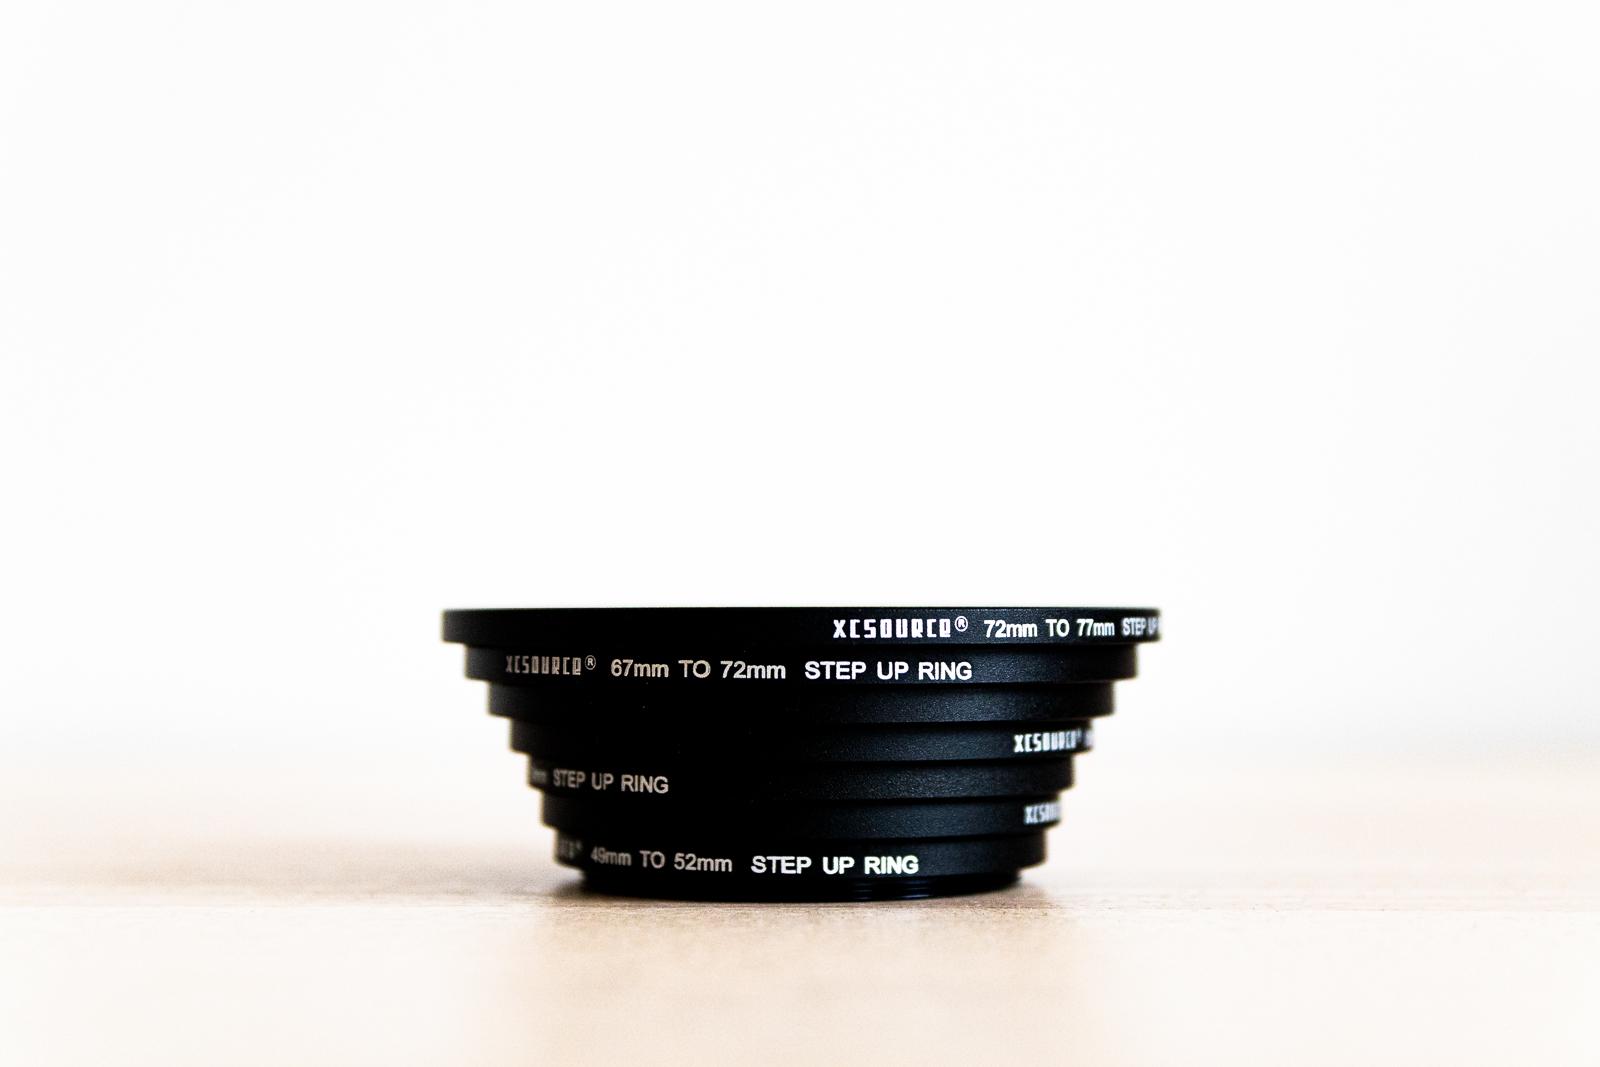 Sigma 17-50 Testfoto | Norbert Eder Photography